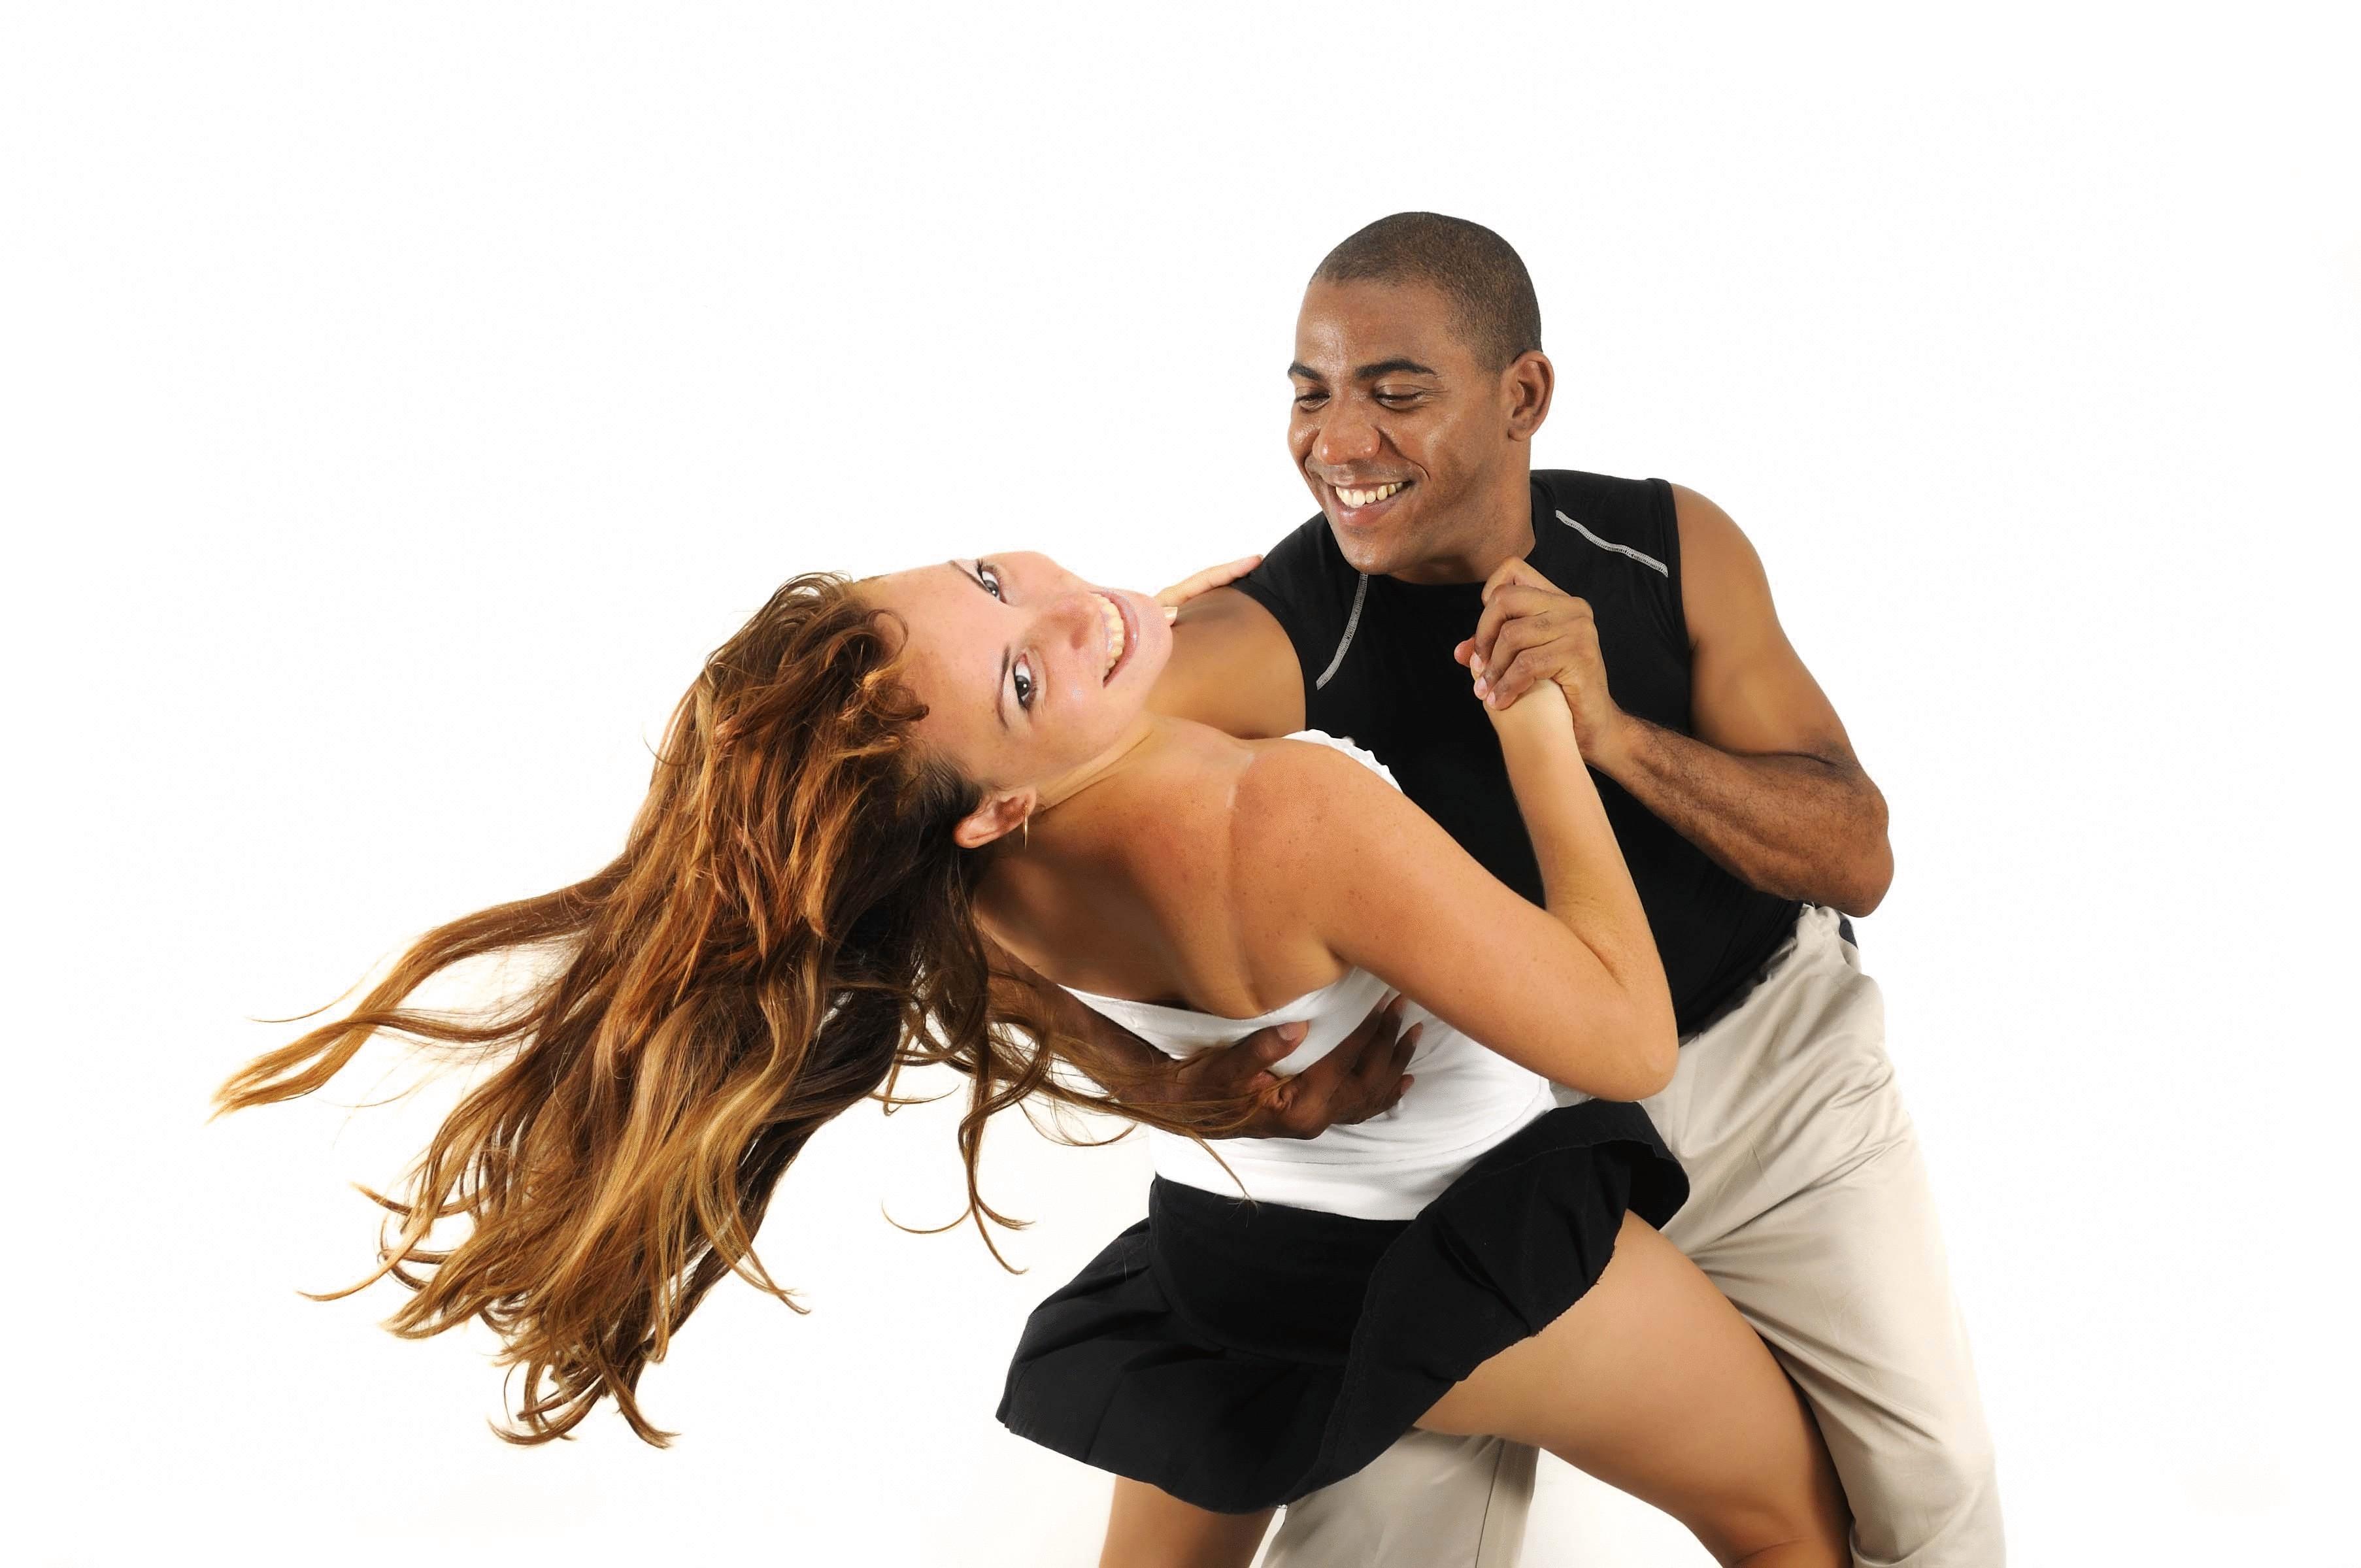 latin dance videos - HD3612×2399